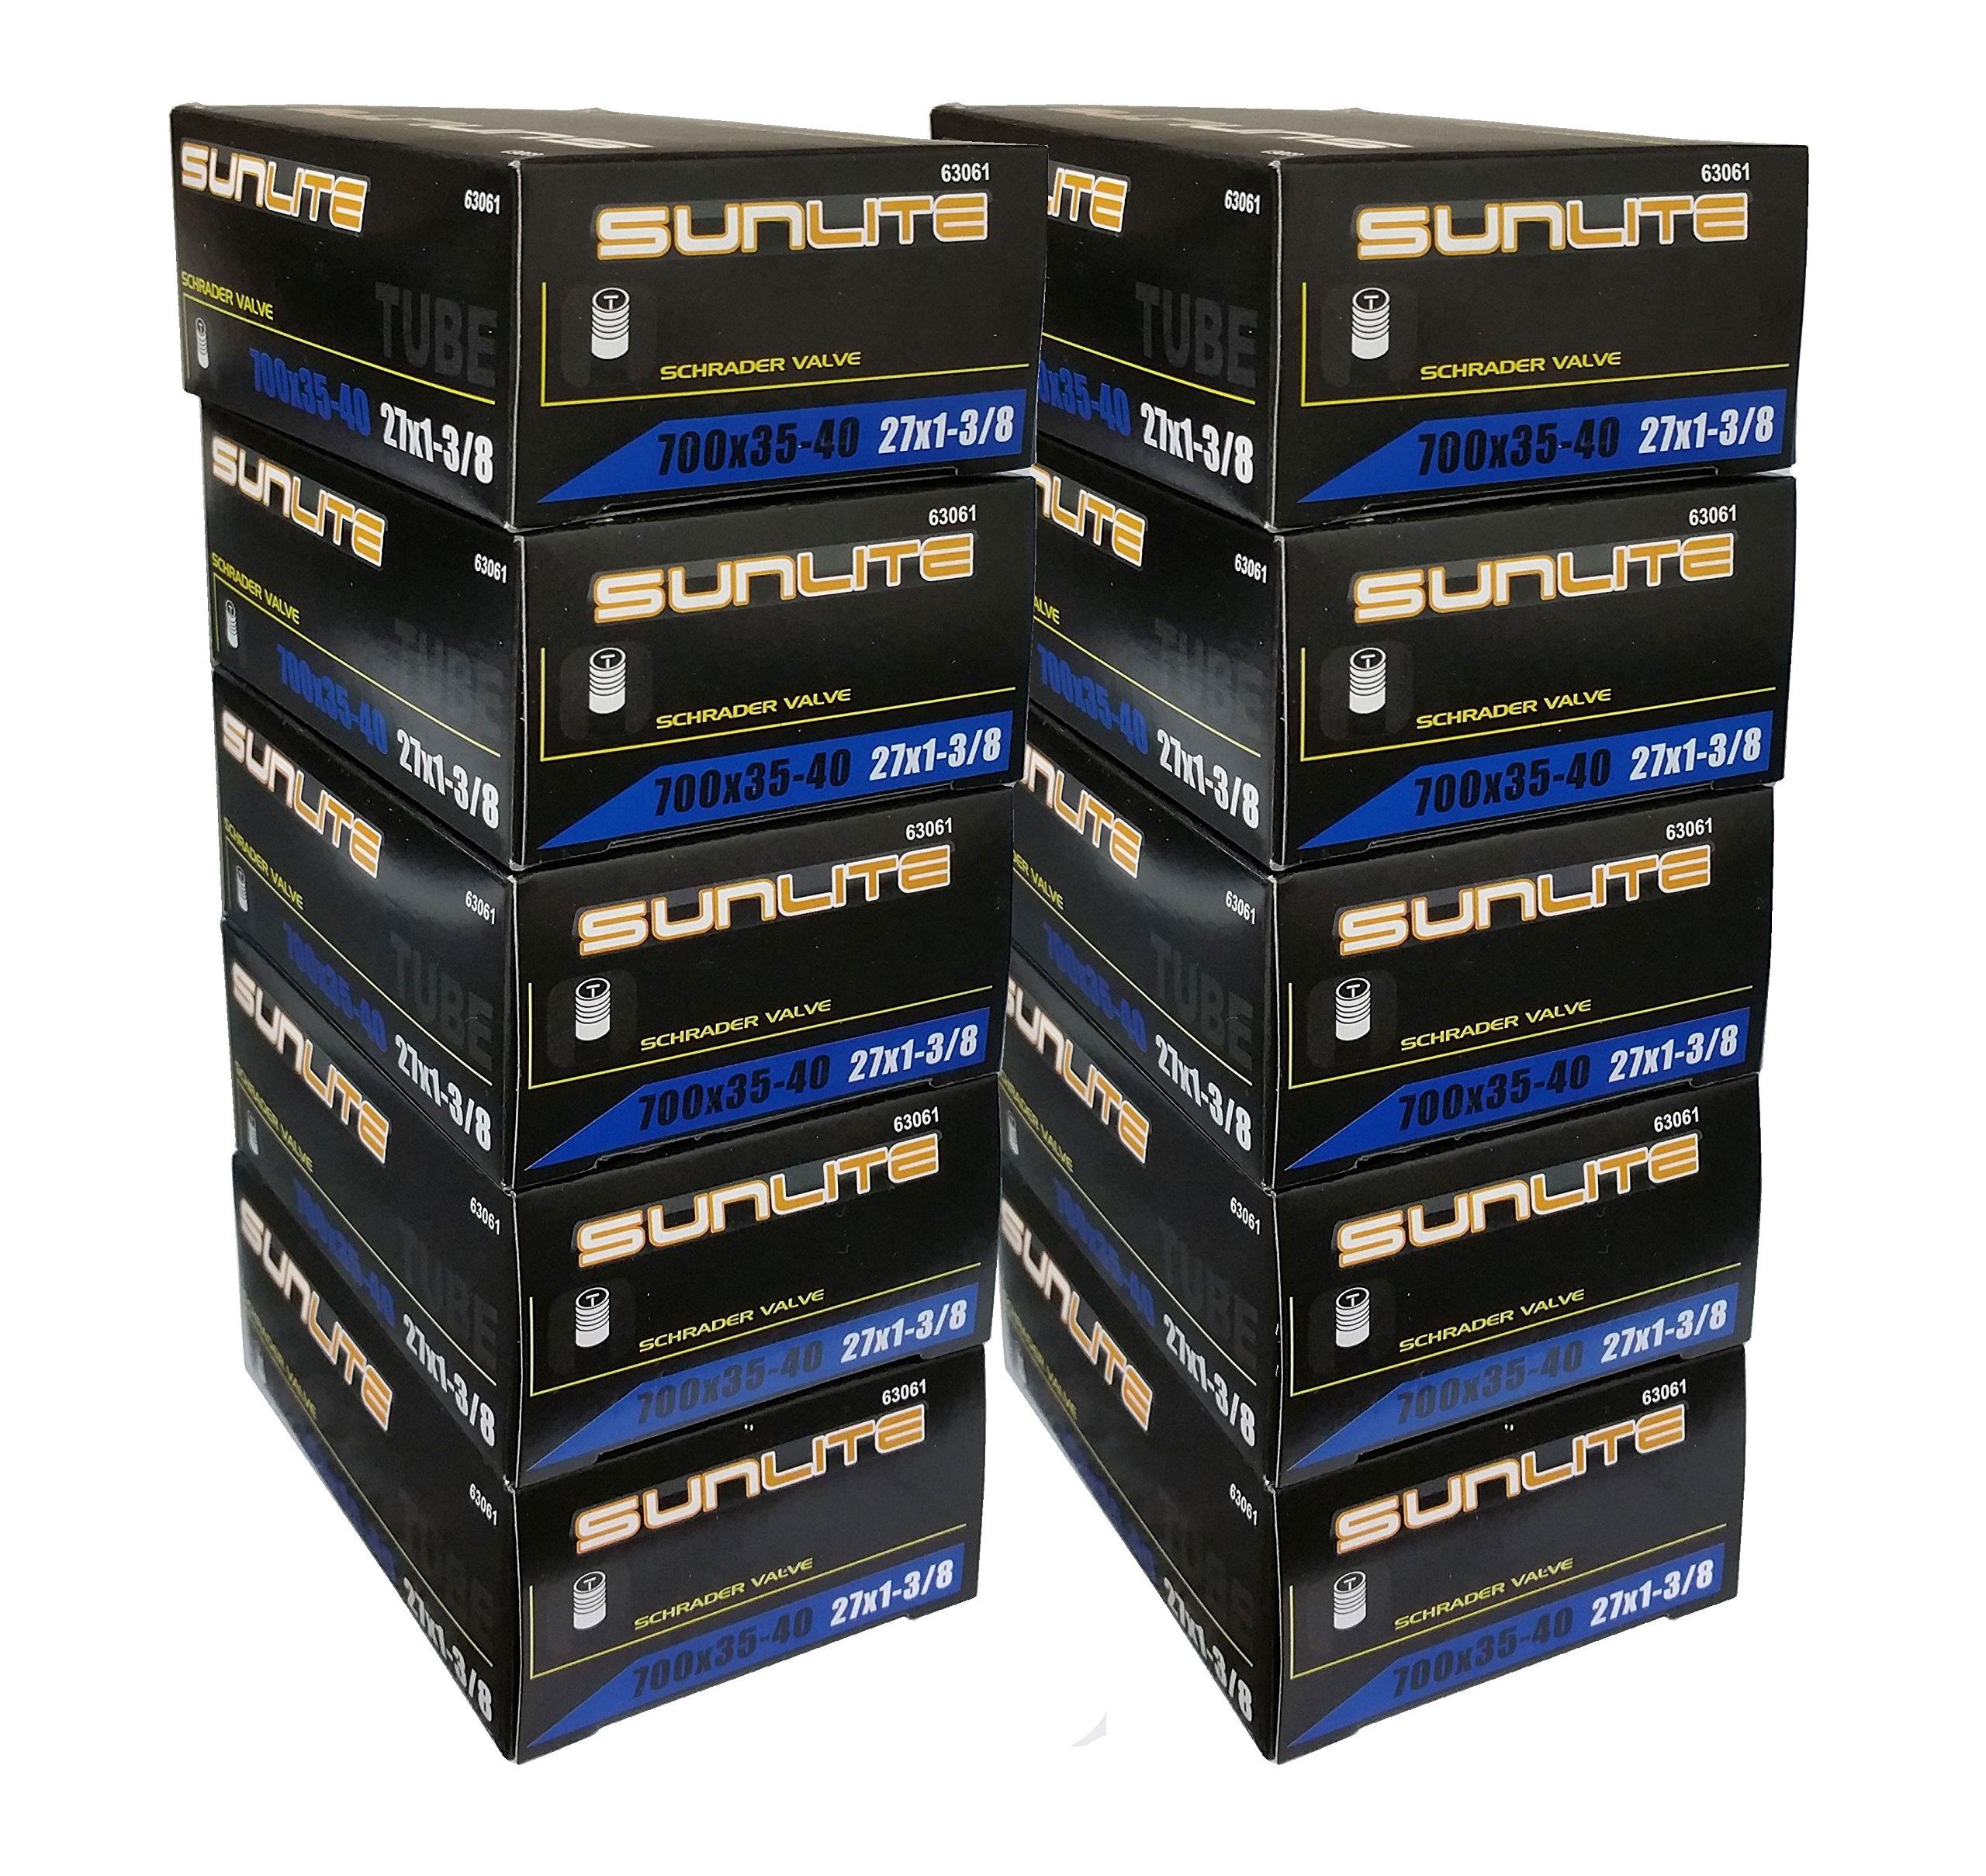 10 PACK SPECIAL - Tube, 700 x 35-40 (27 x 1-3/8) SCHRADER Valve 32mm, Sunlite (10 PACK SPECIAL)